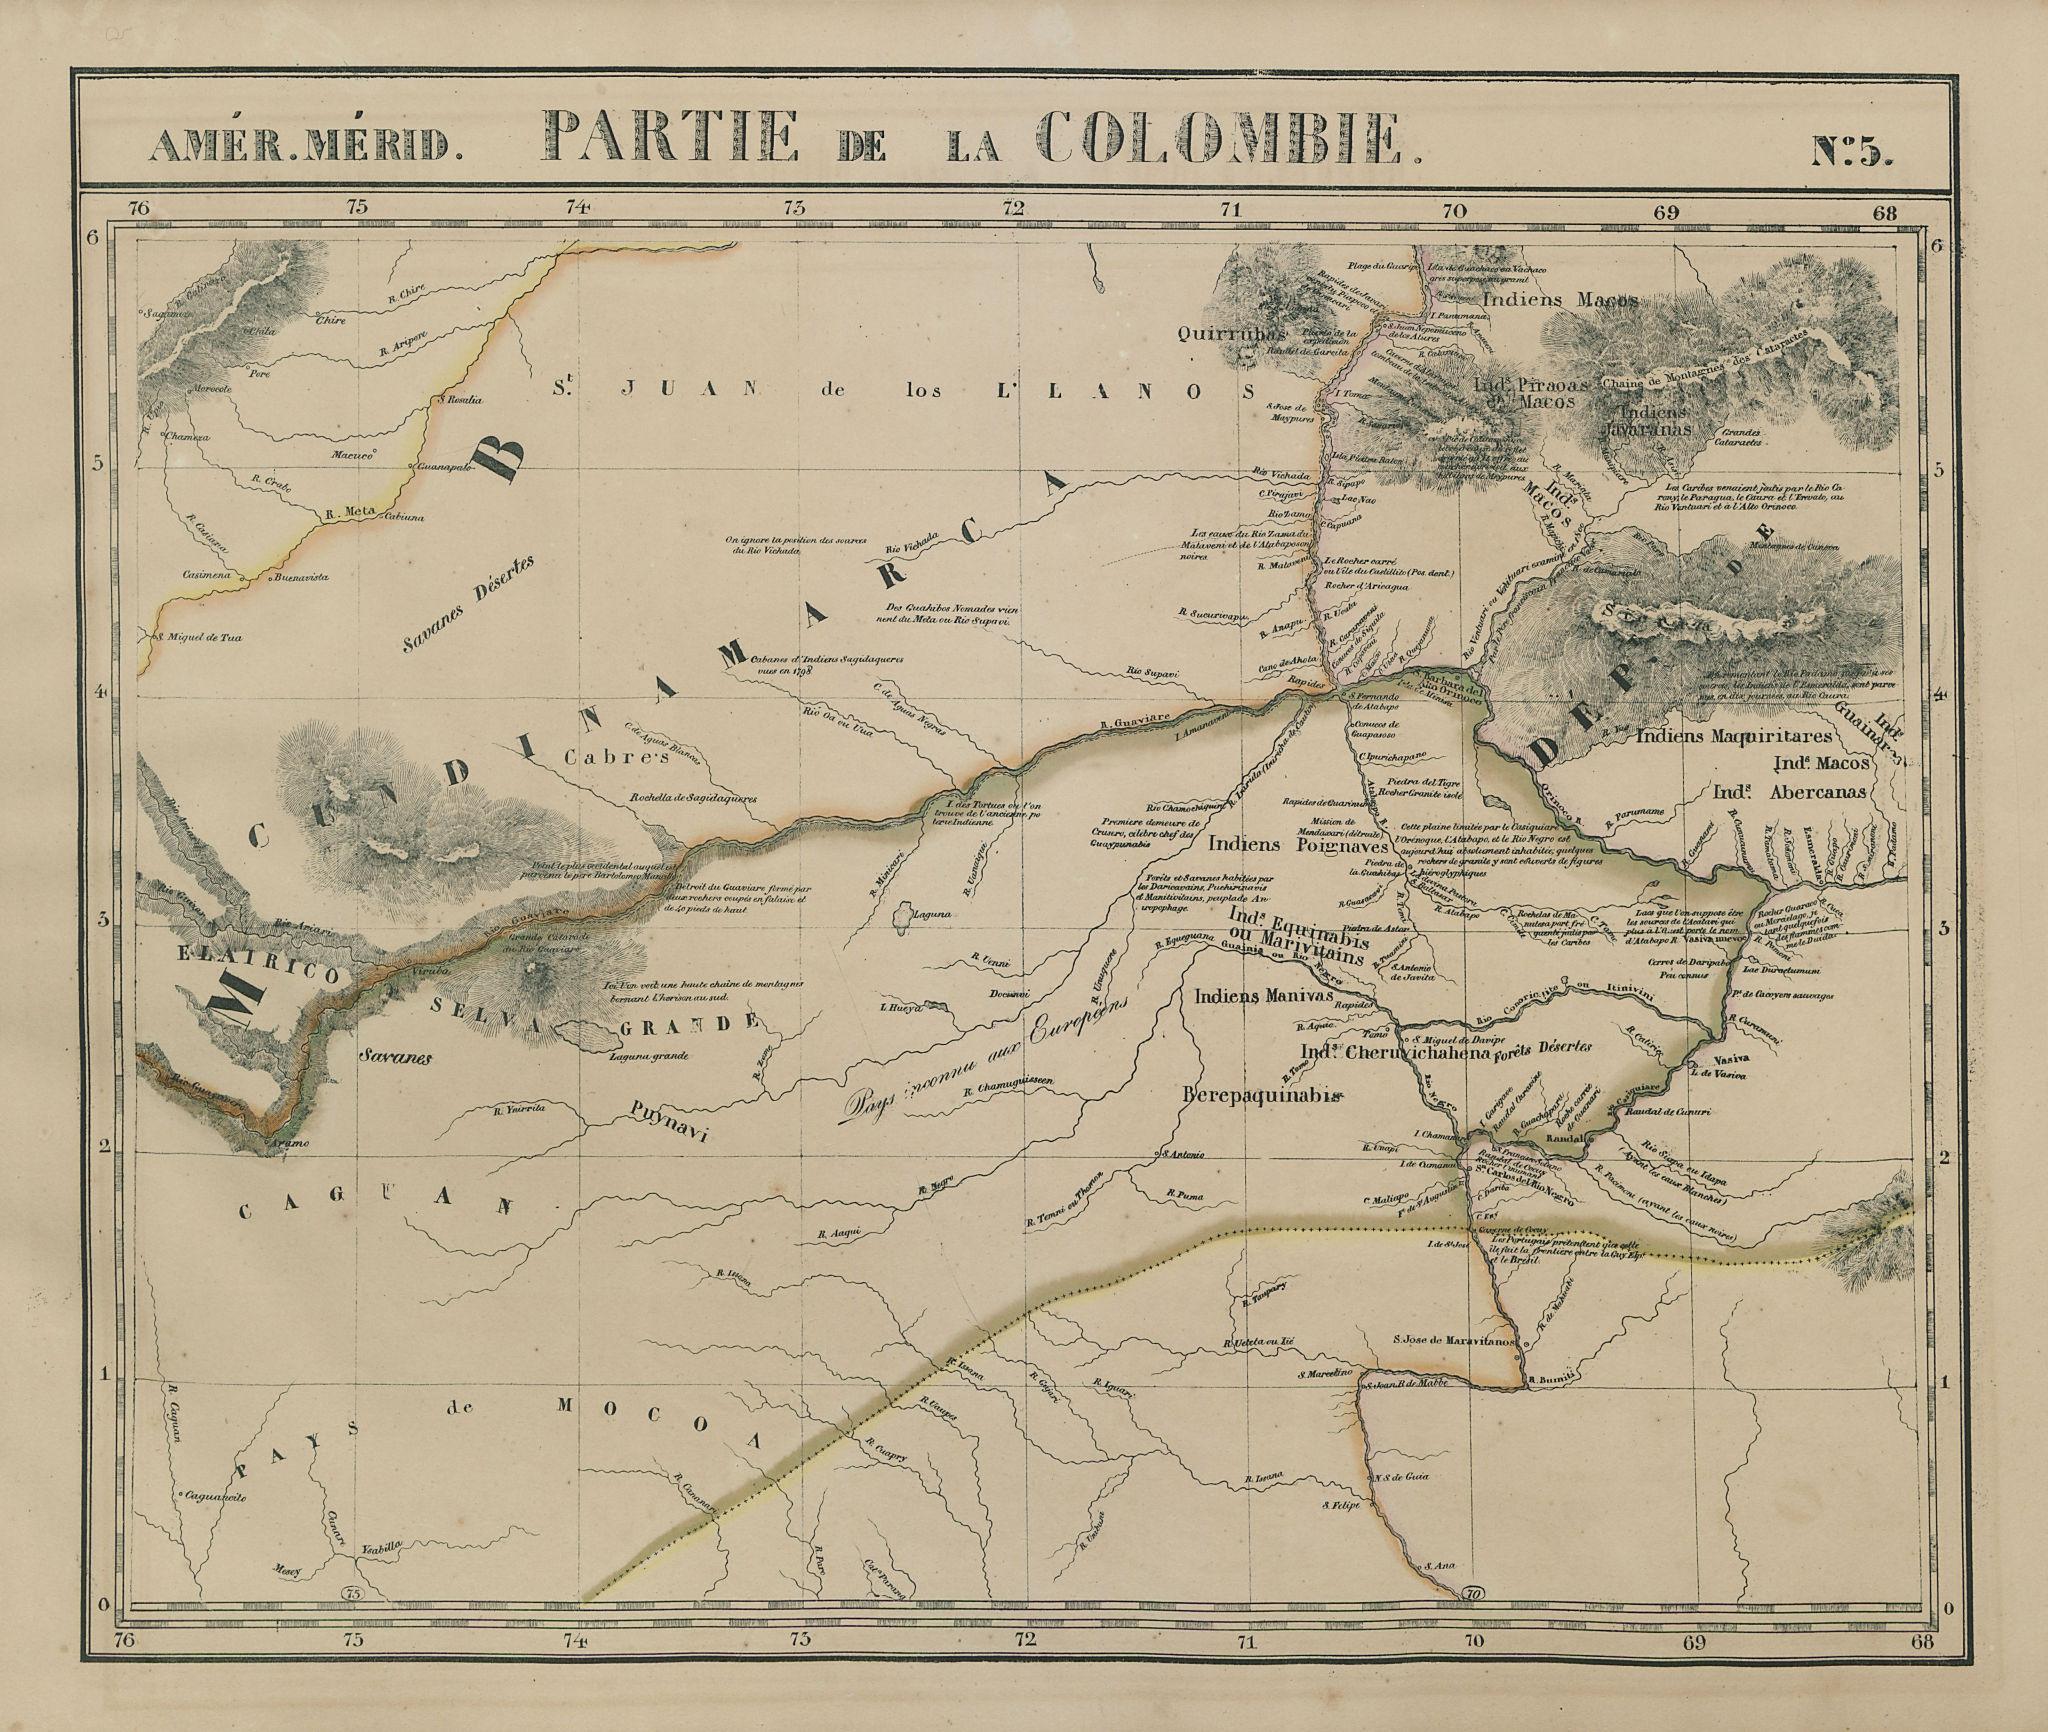 Amér Mér. Colombie #5 Eastern Colombia. NW Amazonas Brazil VANDERMAELEN 1827 map